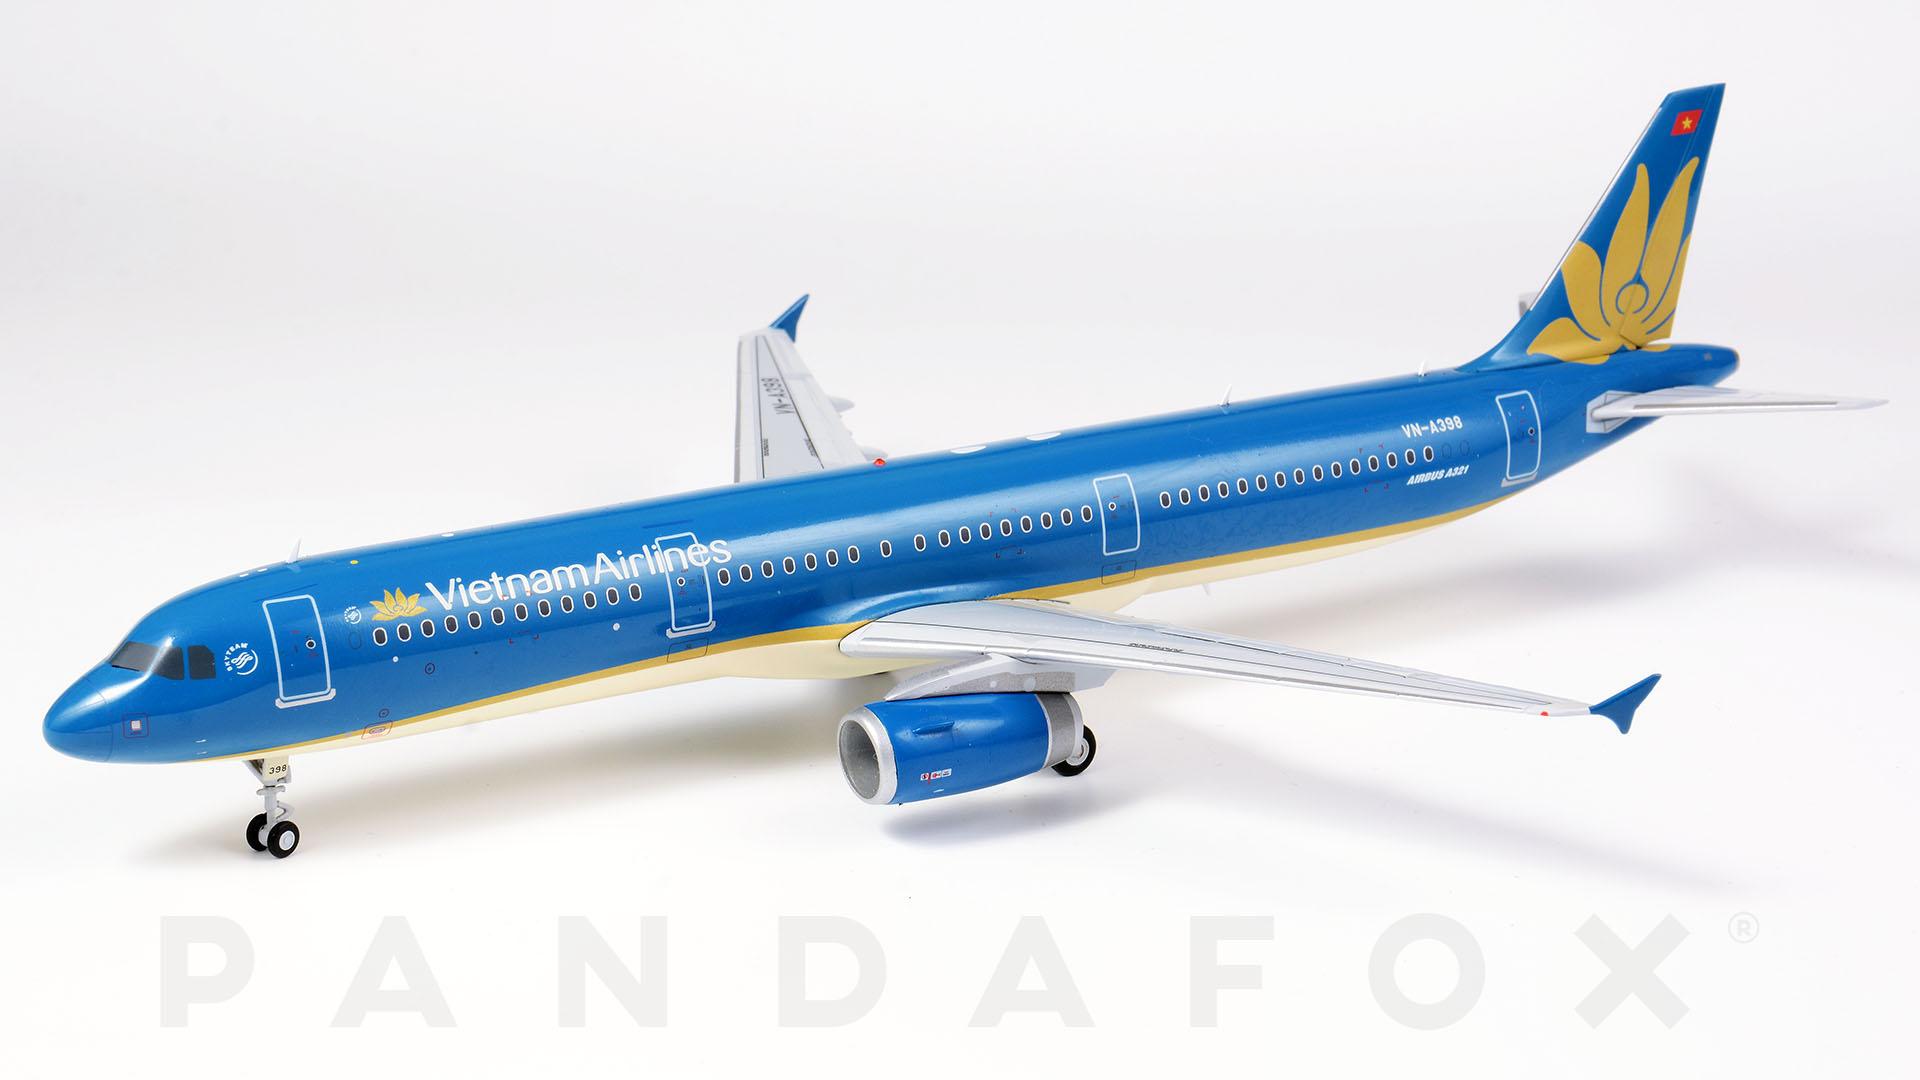 Mo Hinh May Bay Vietnam Airlines Airbus A321 Vn A398 Pandafox Toys Vietnam May Bay Mo Hinh Tĩnh